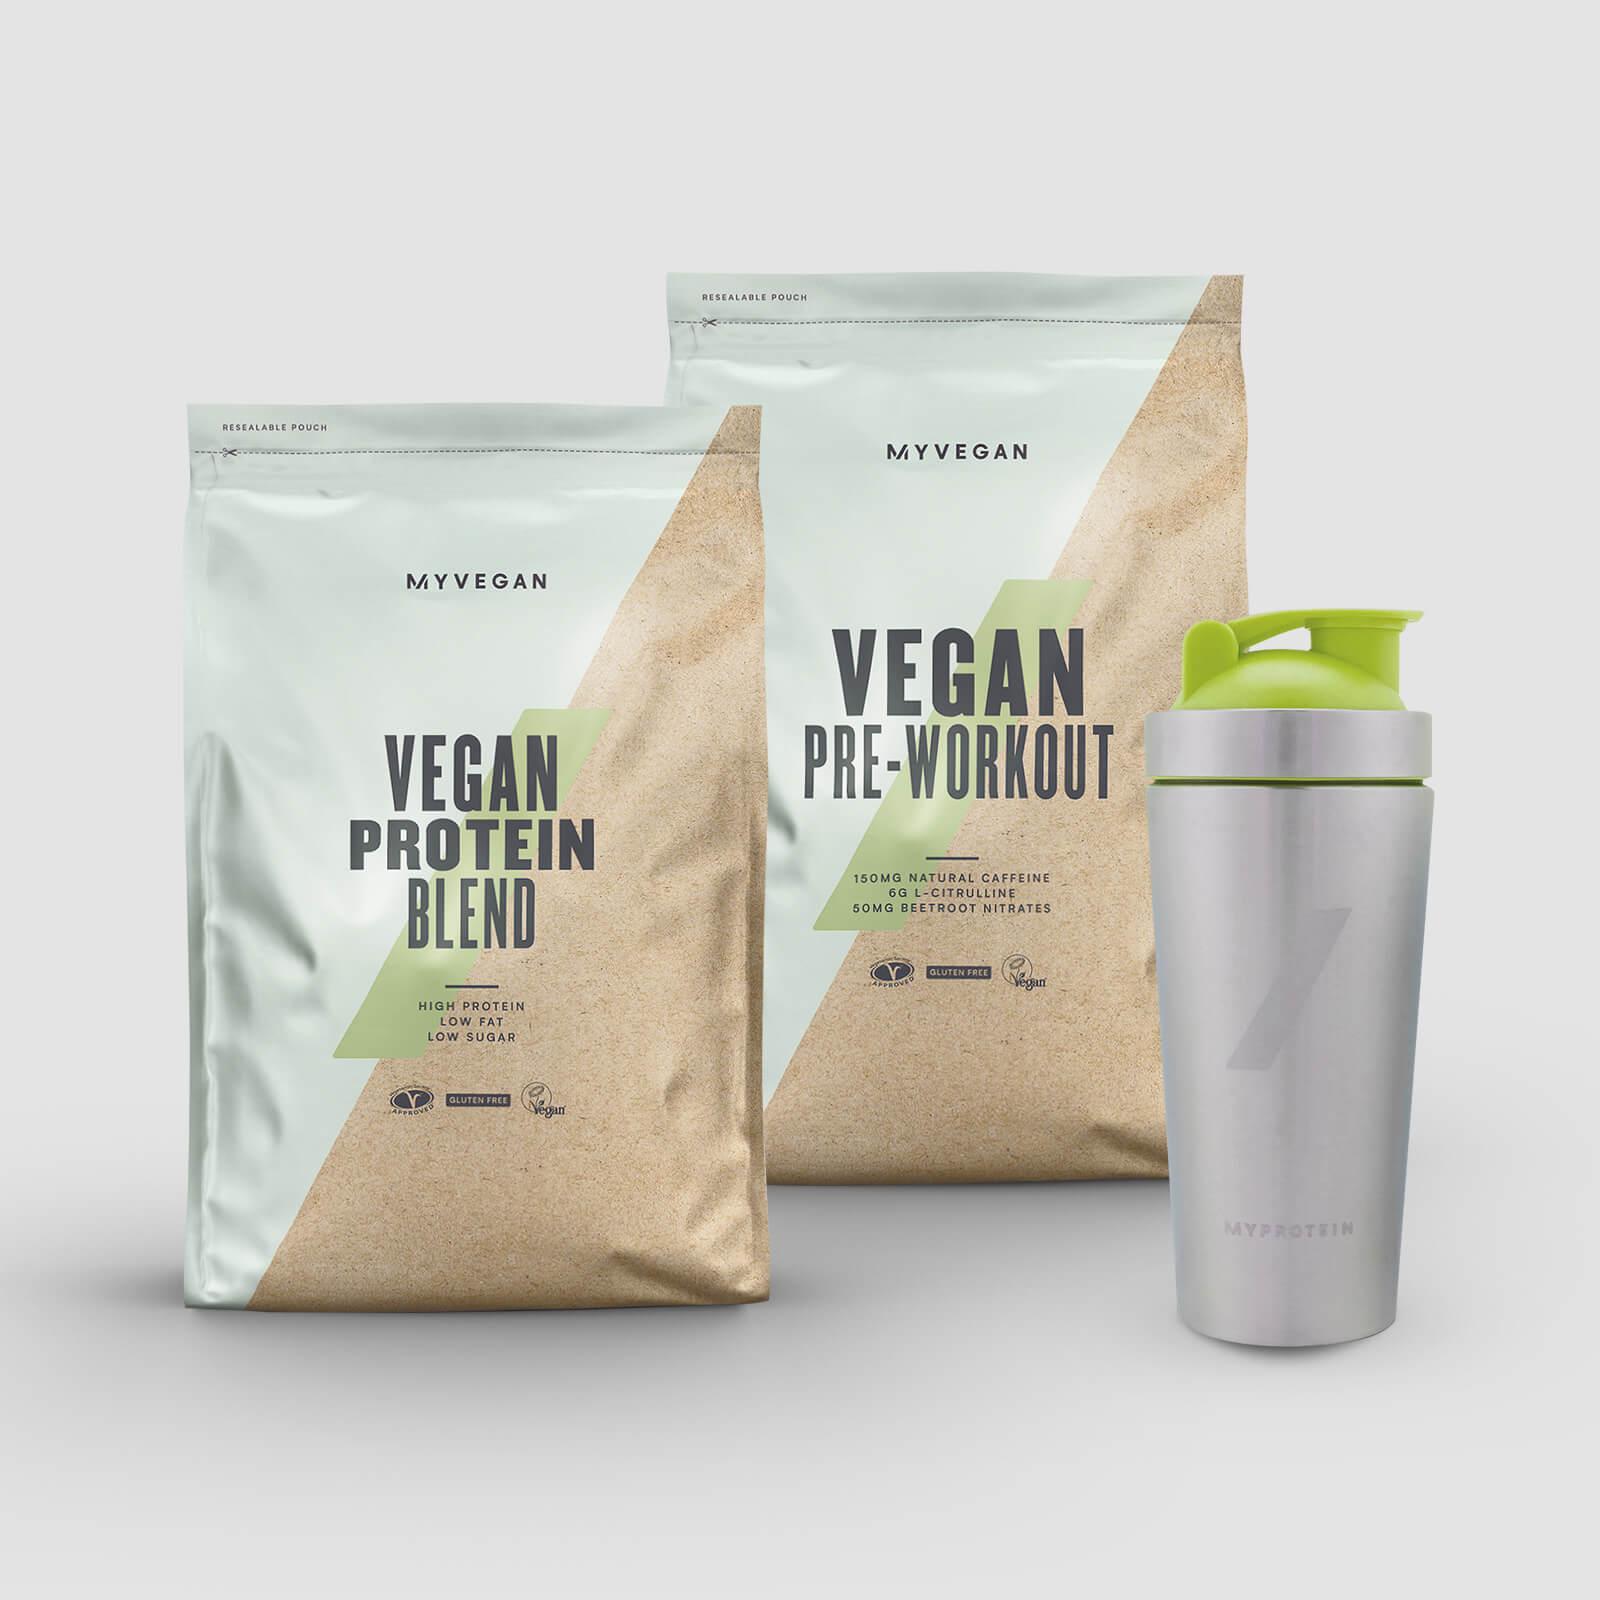 Pack performance vegan - Sour Apple - Chocolate